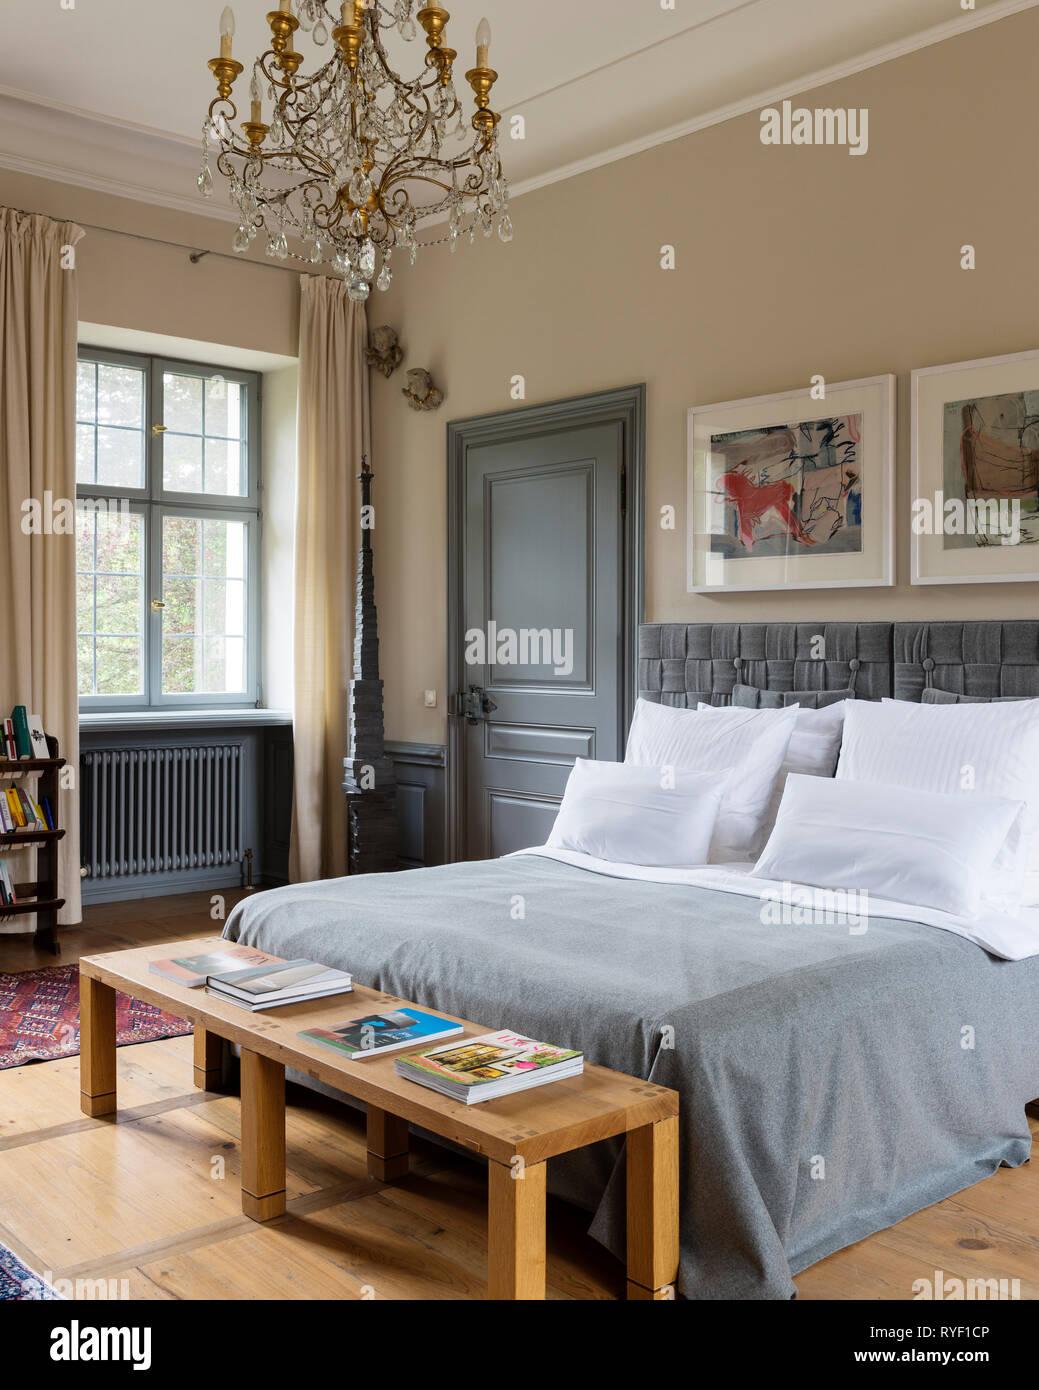 Edwardian Bedroom In Schloss Unterleinleiter In Bavaria Germany Stock Photo Alamy